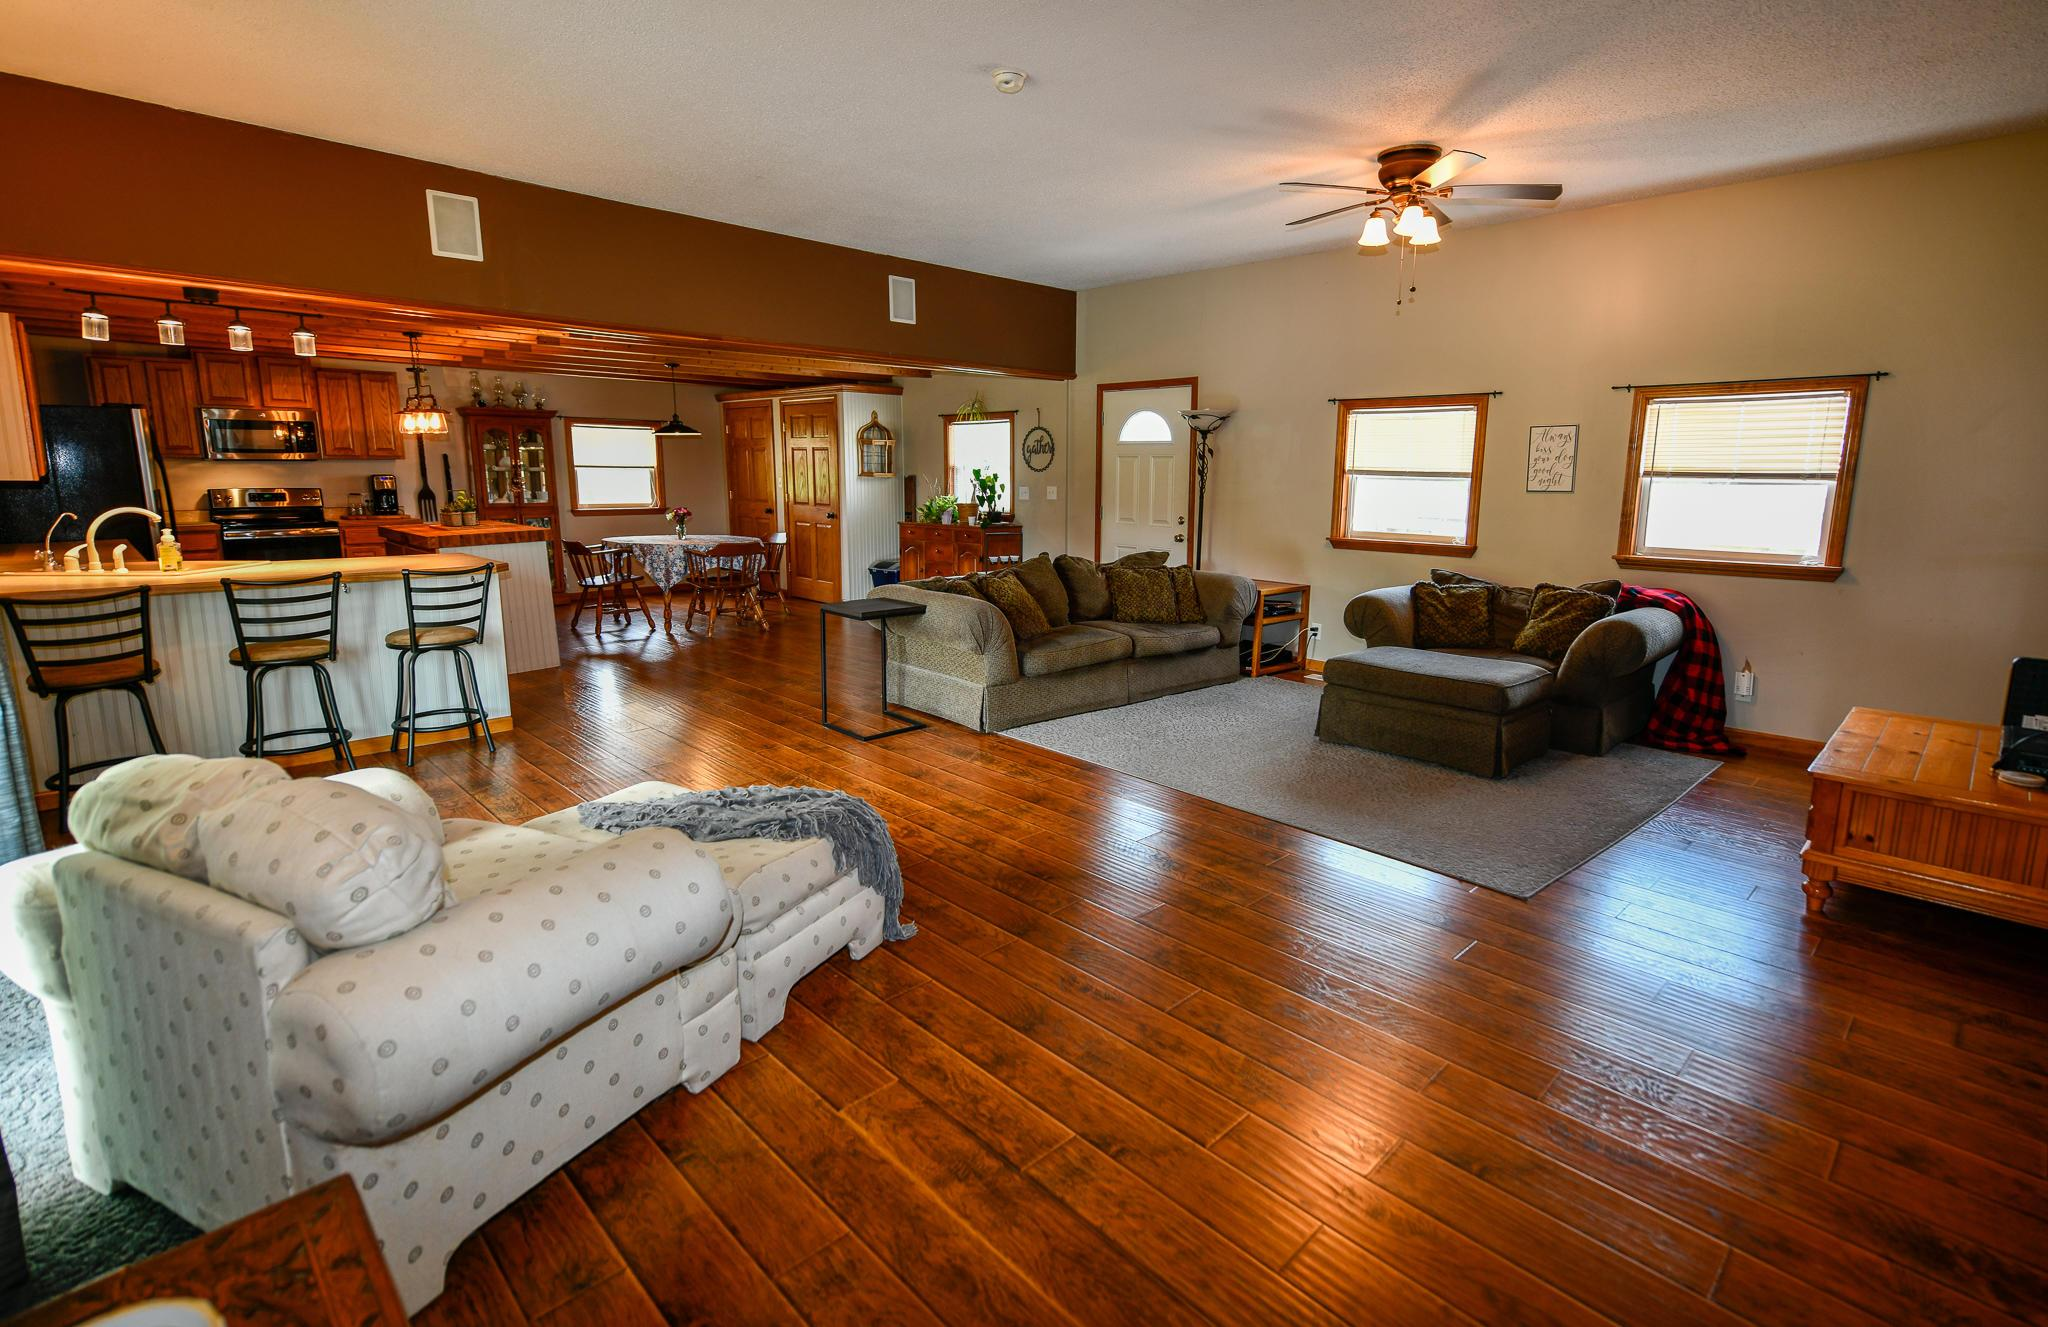 Living Area: 20'x22'